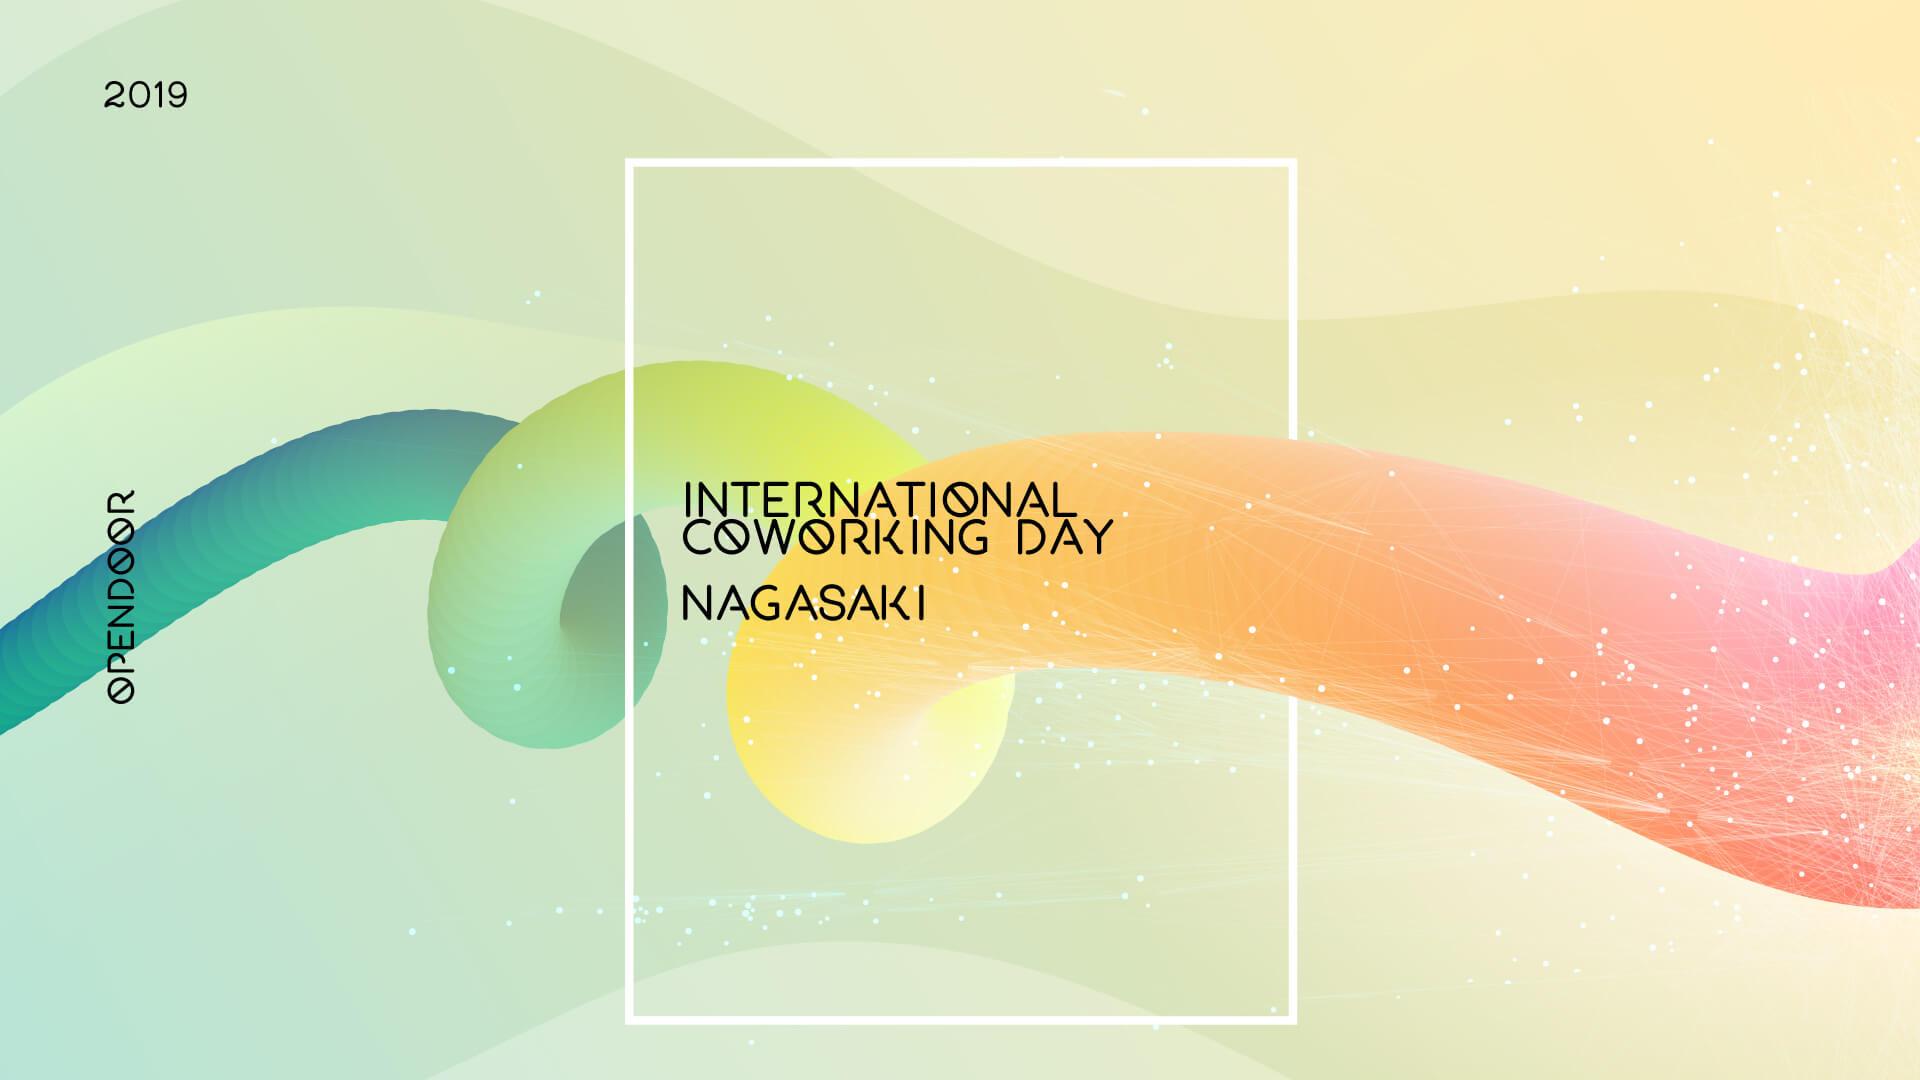 International Coworking Day 2019